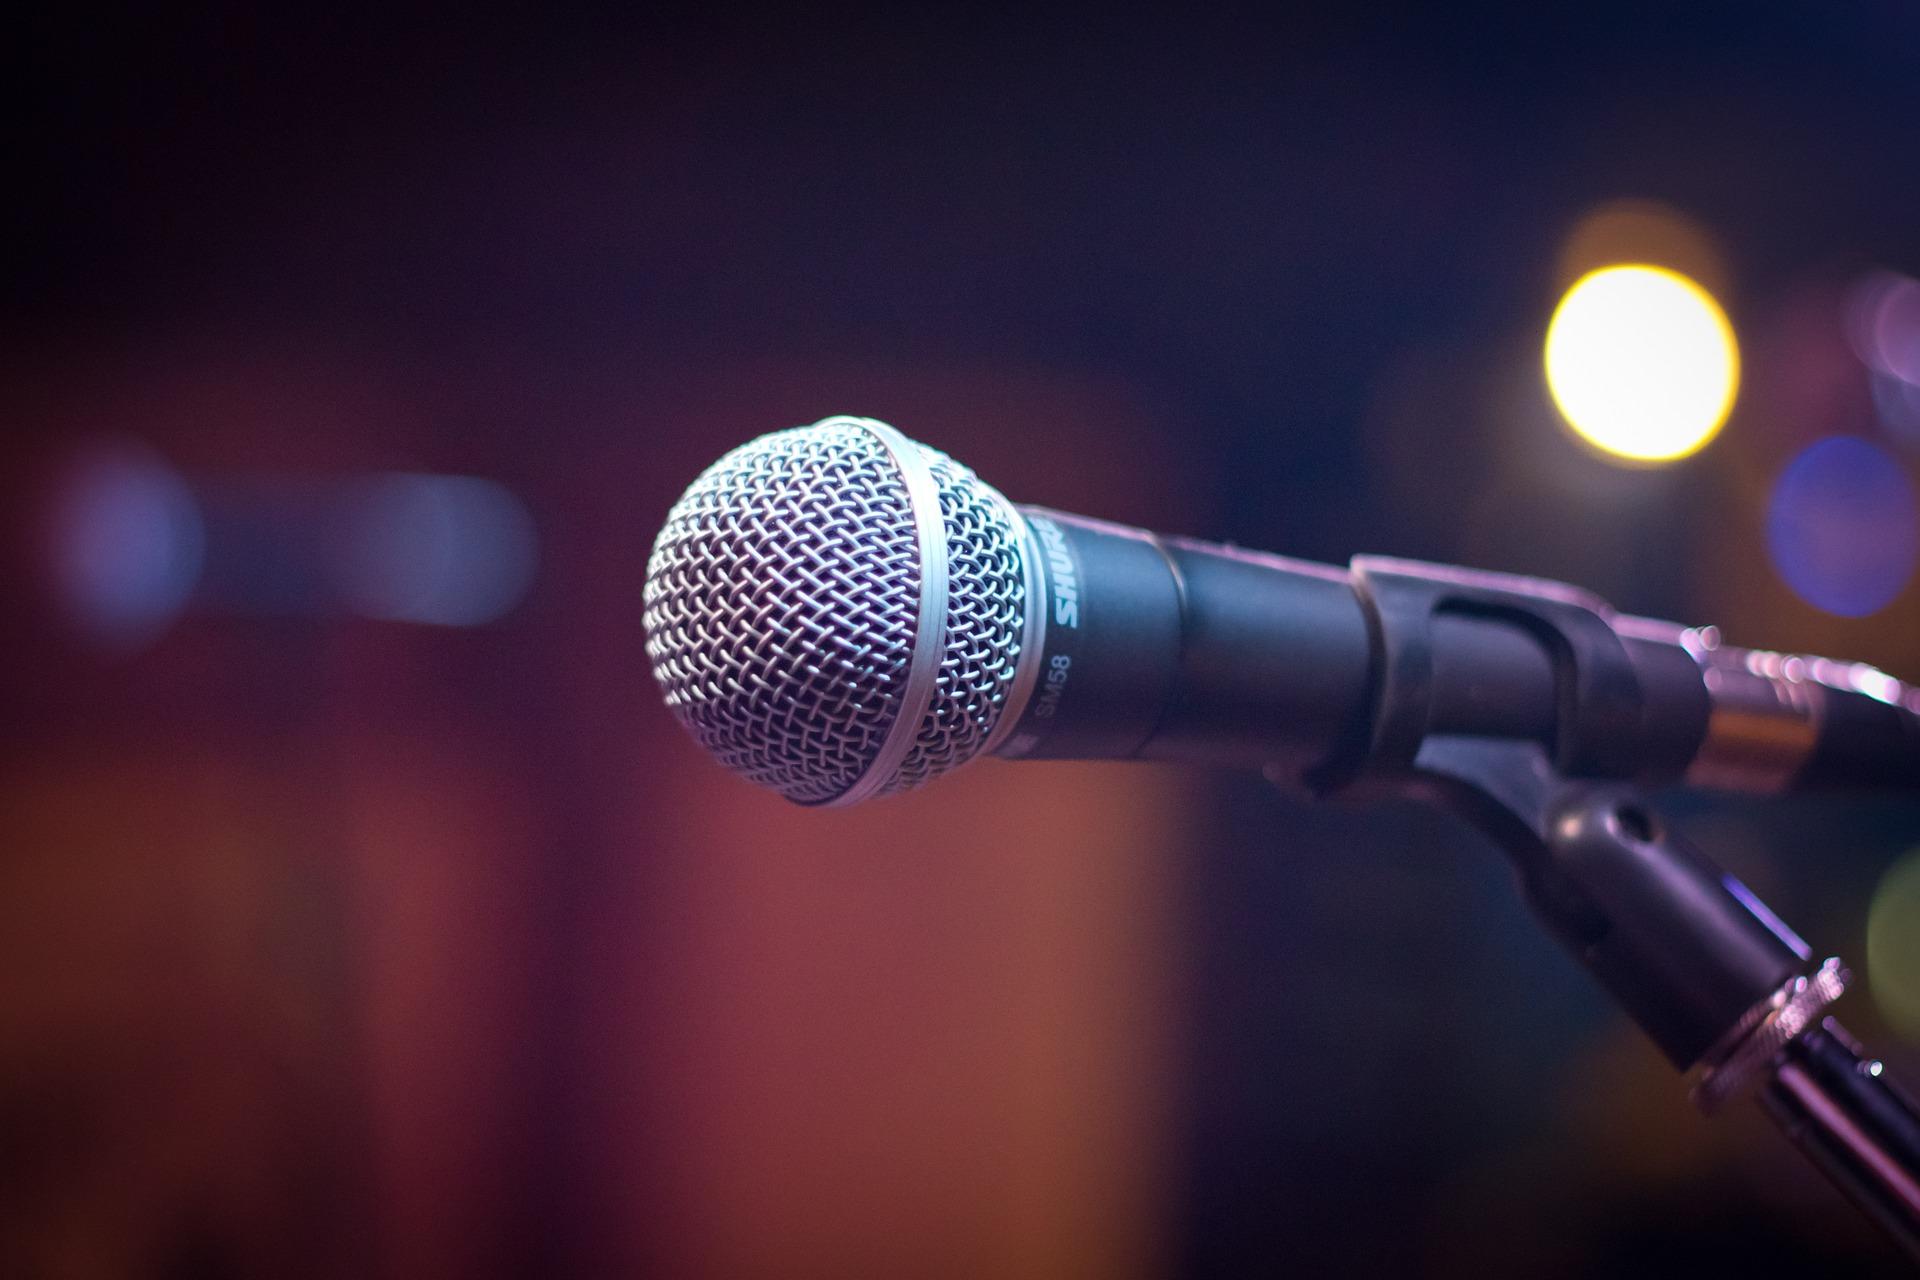 microphone-1261793_1920.jpg